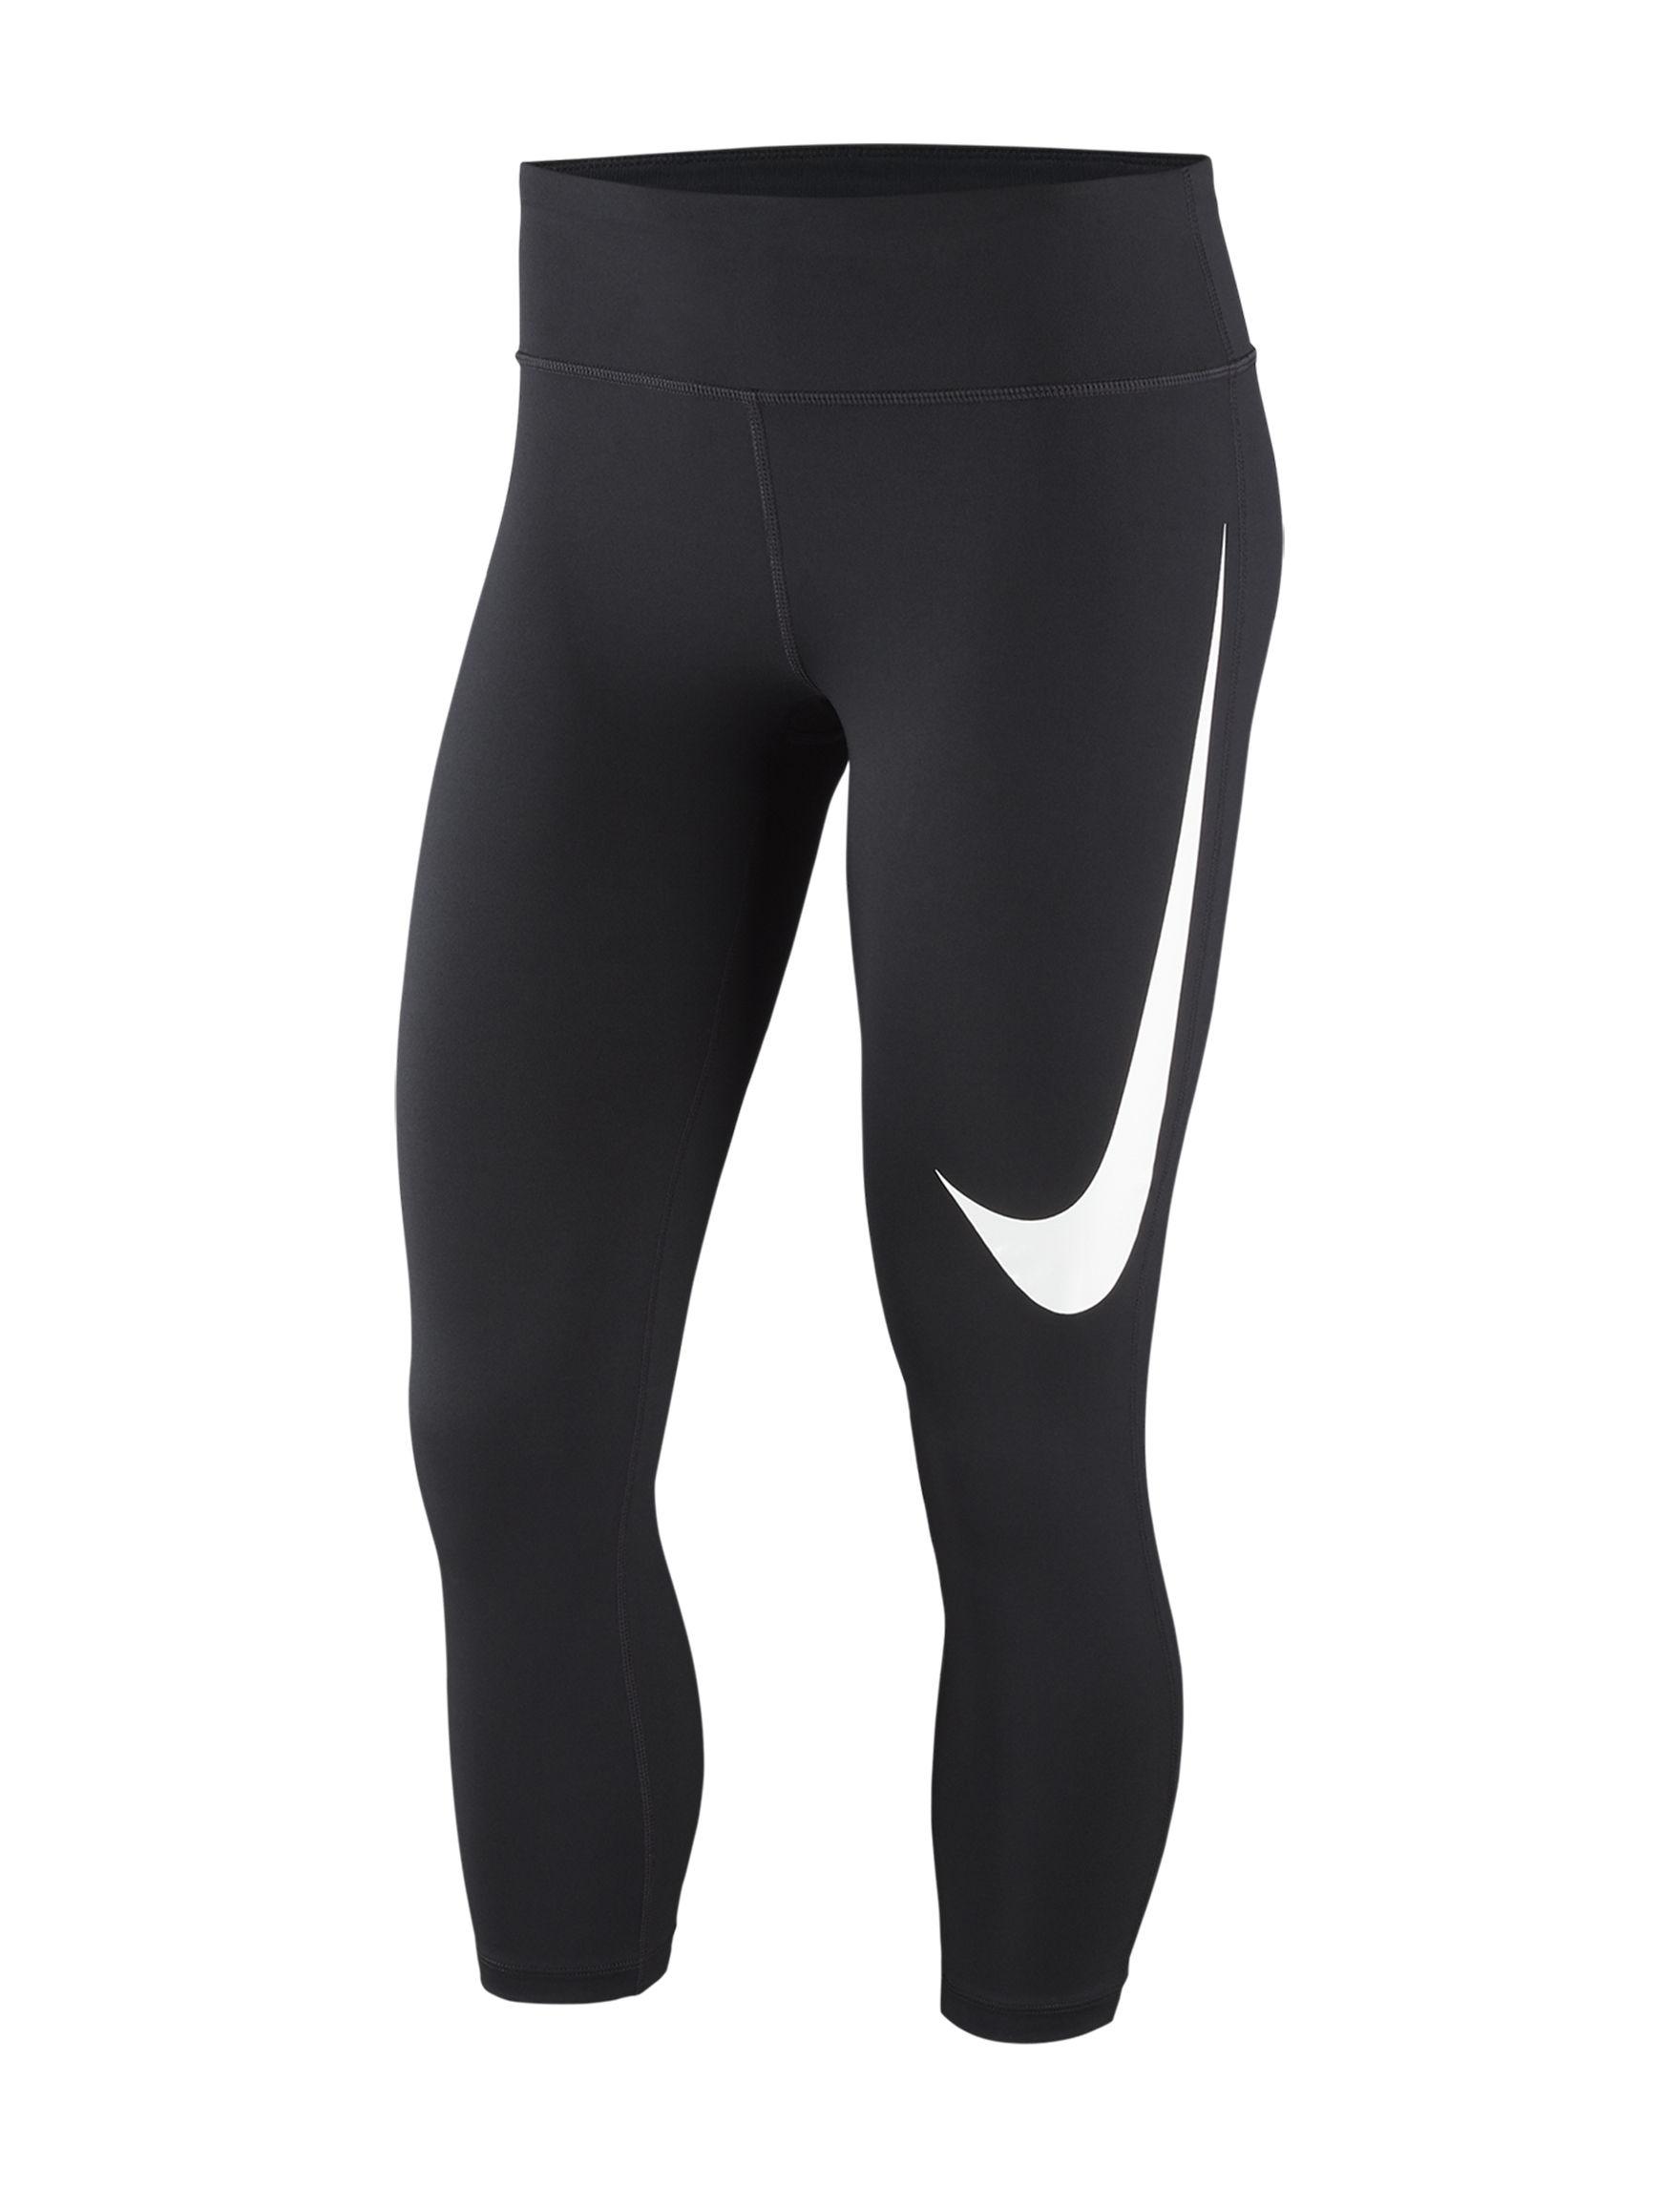 Nike Black /  White Capris & Crops Leggings